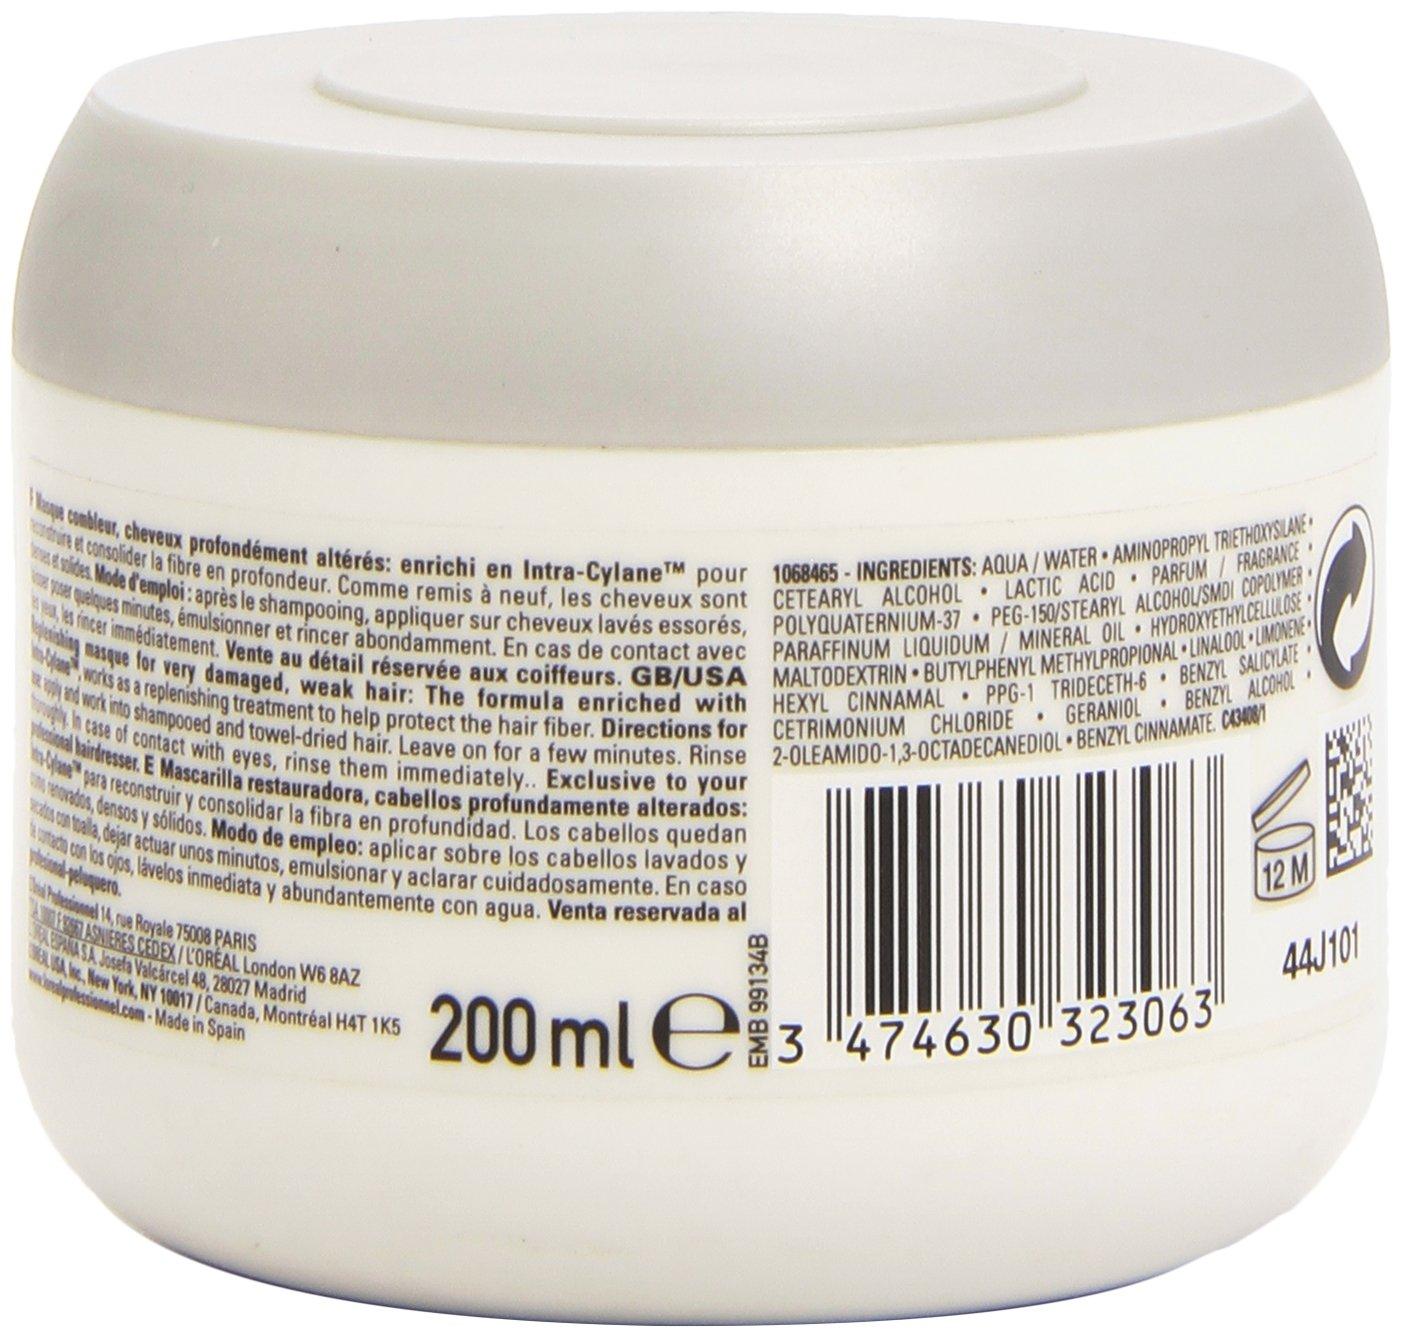 LOréal Professionnel Expert - Fiberceutic Intra-Cylane - Mascarilla restauradora para cabellos alterados - 200 ml: Amazon.es: Belleza